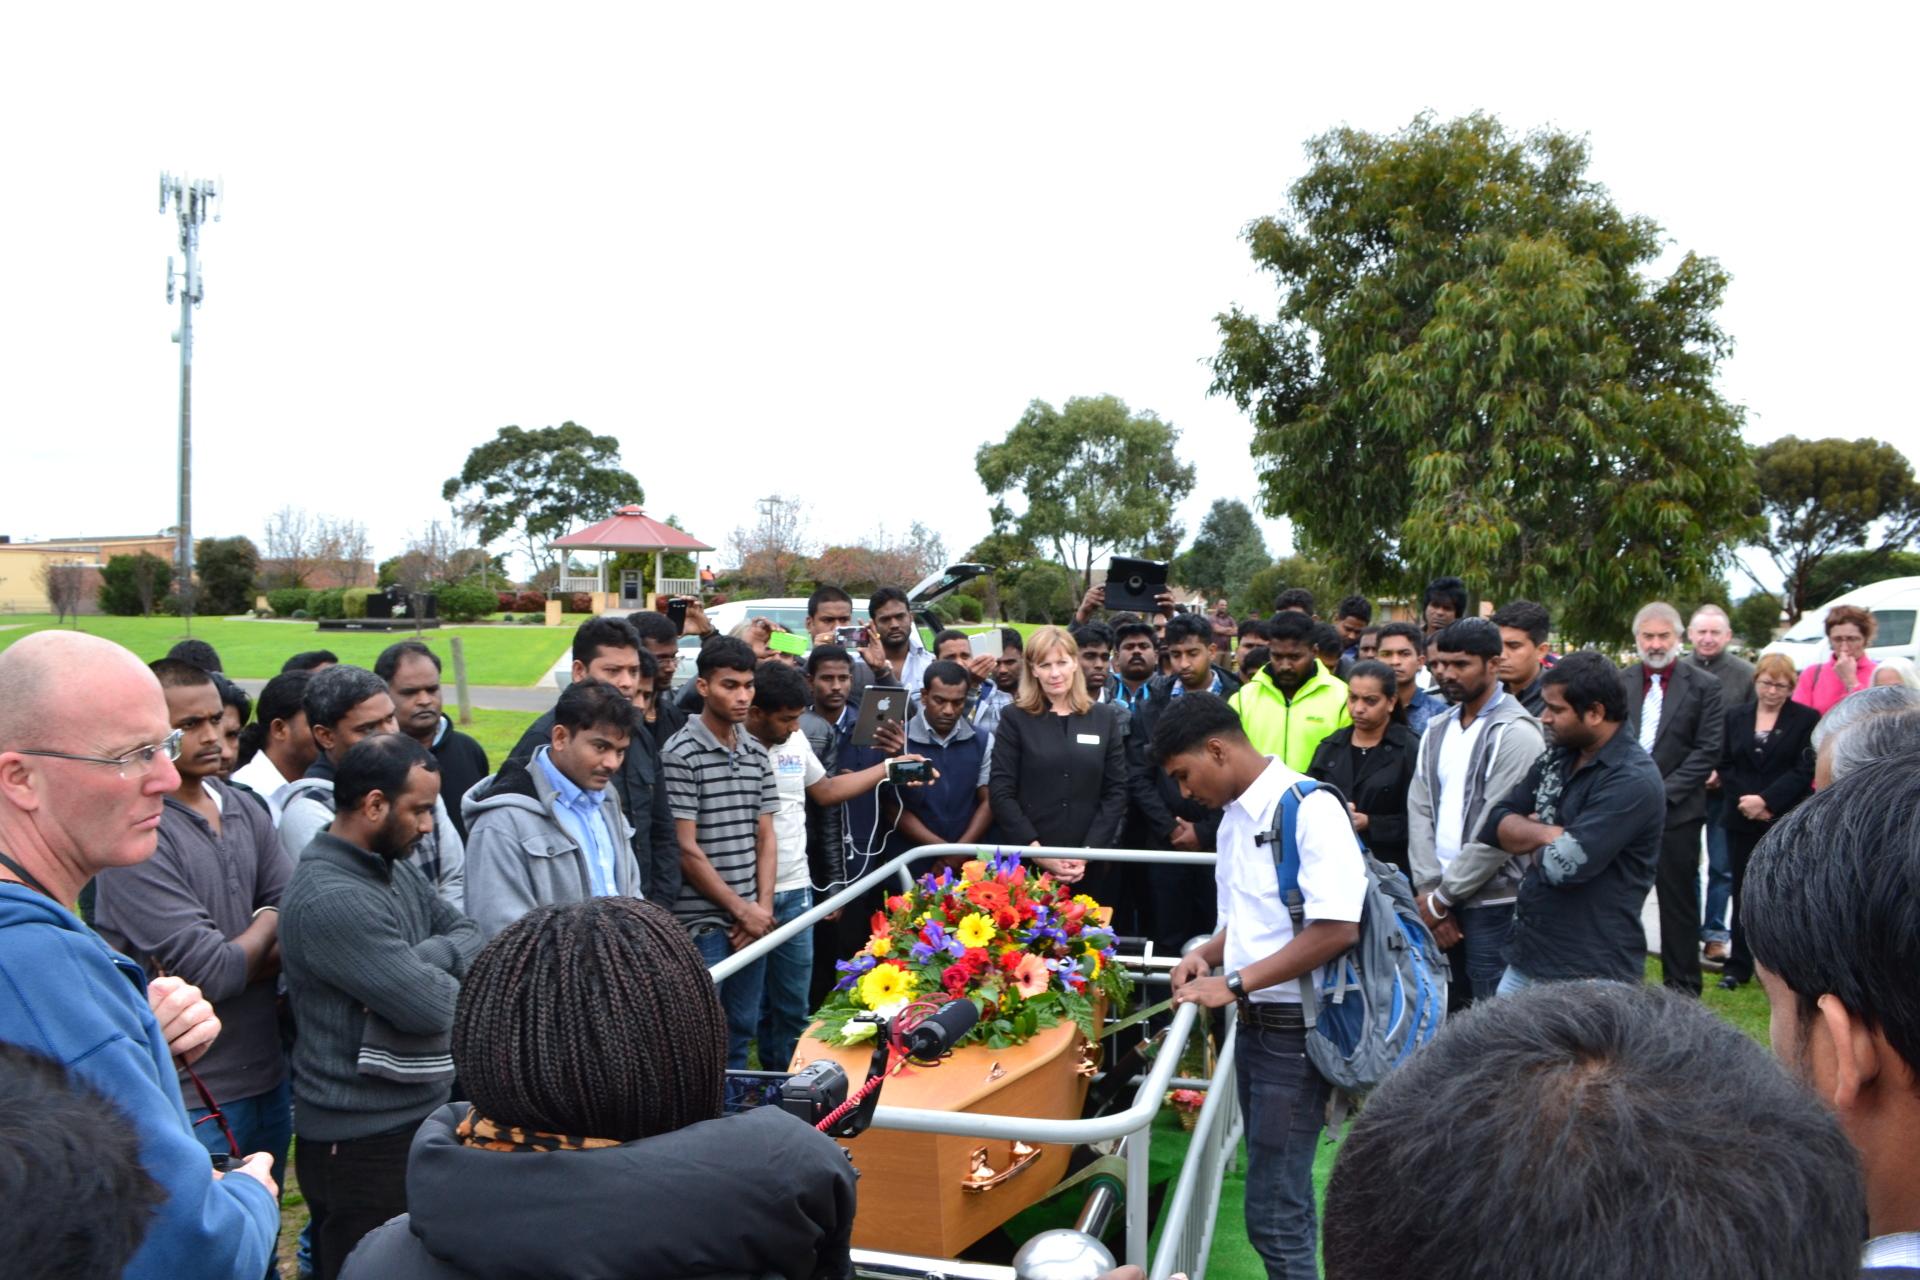 Funeral of Leo Seemanpillai